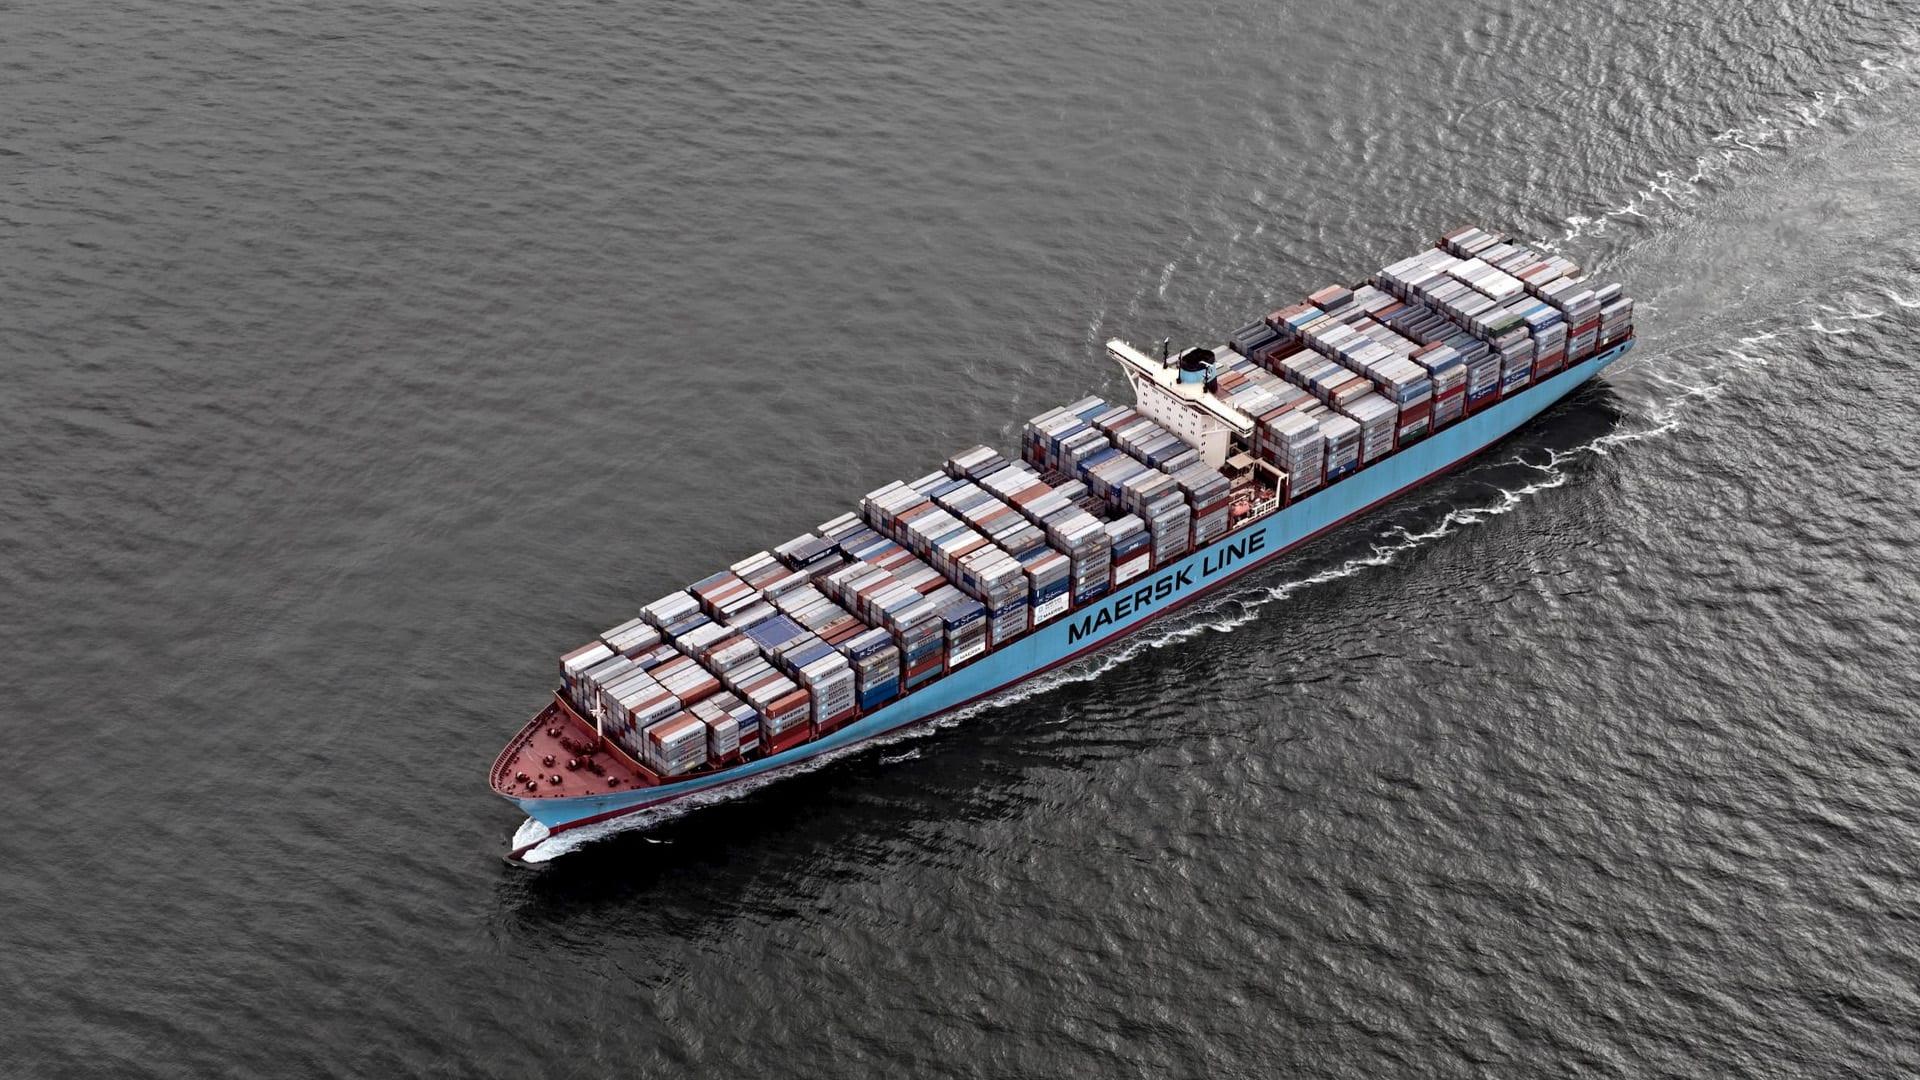 Maersk Posts Higher Earnings in 2019, Expects Weak Start of 2020 amid Coronavirus Outbreak